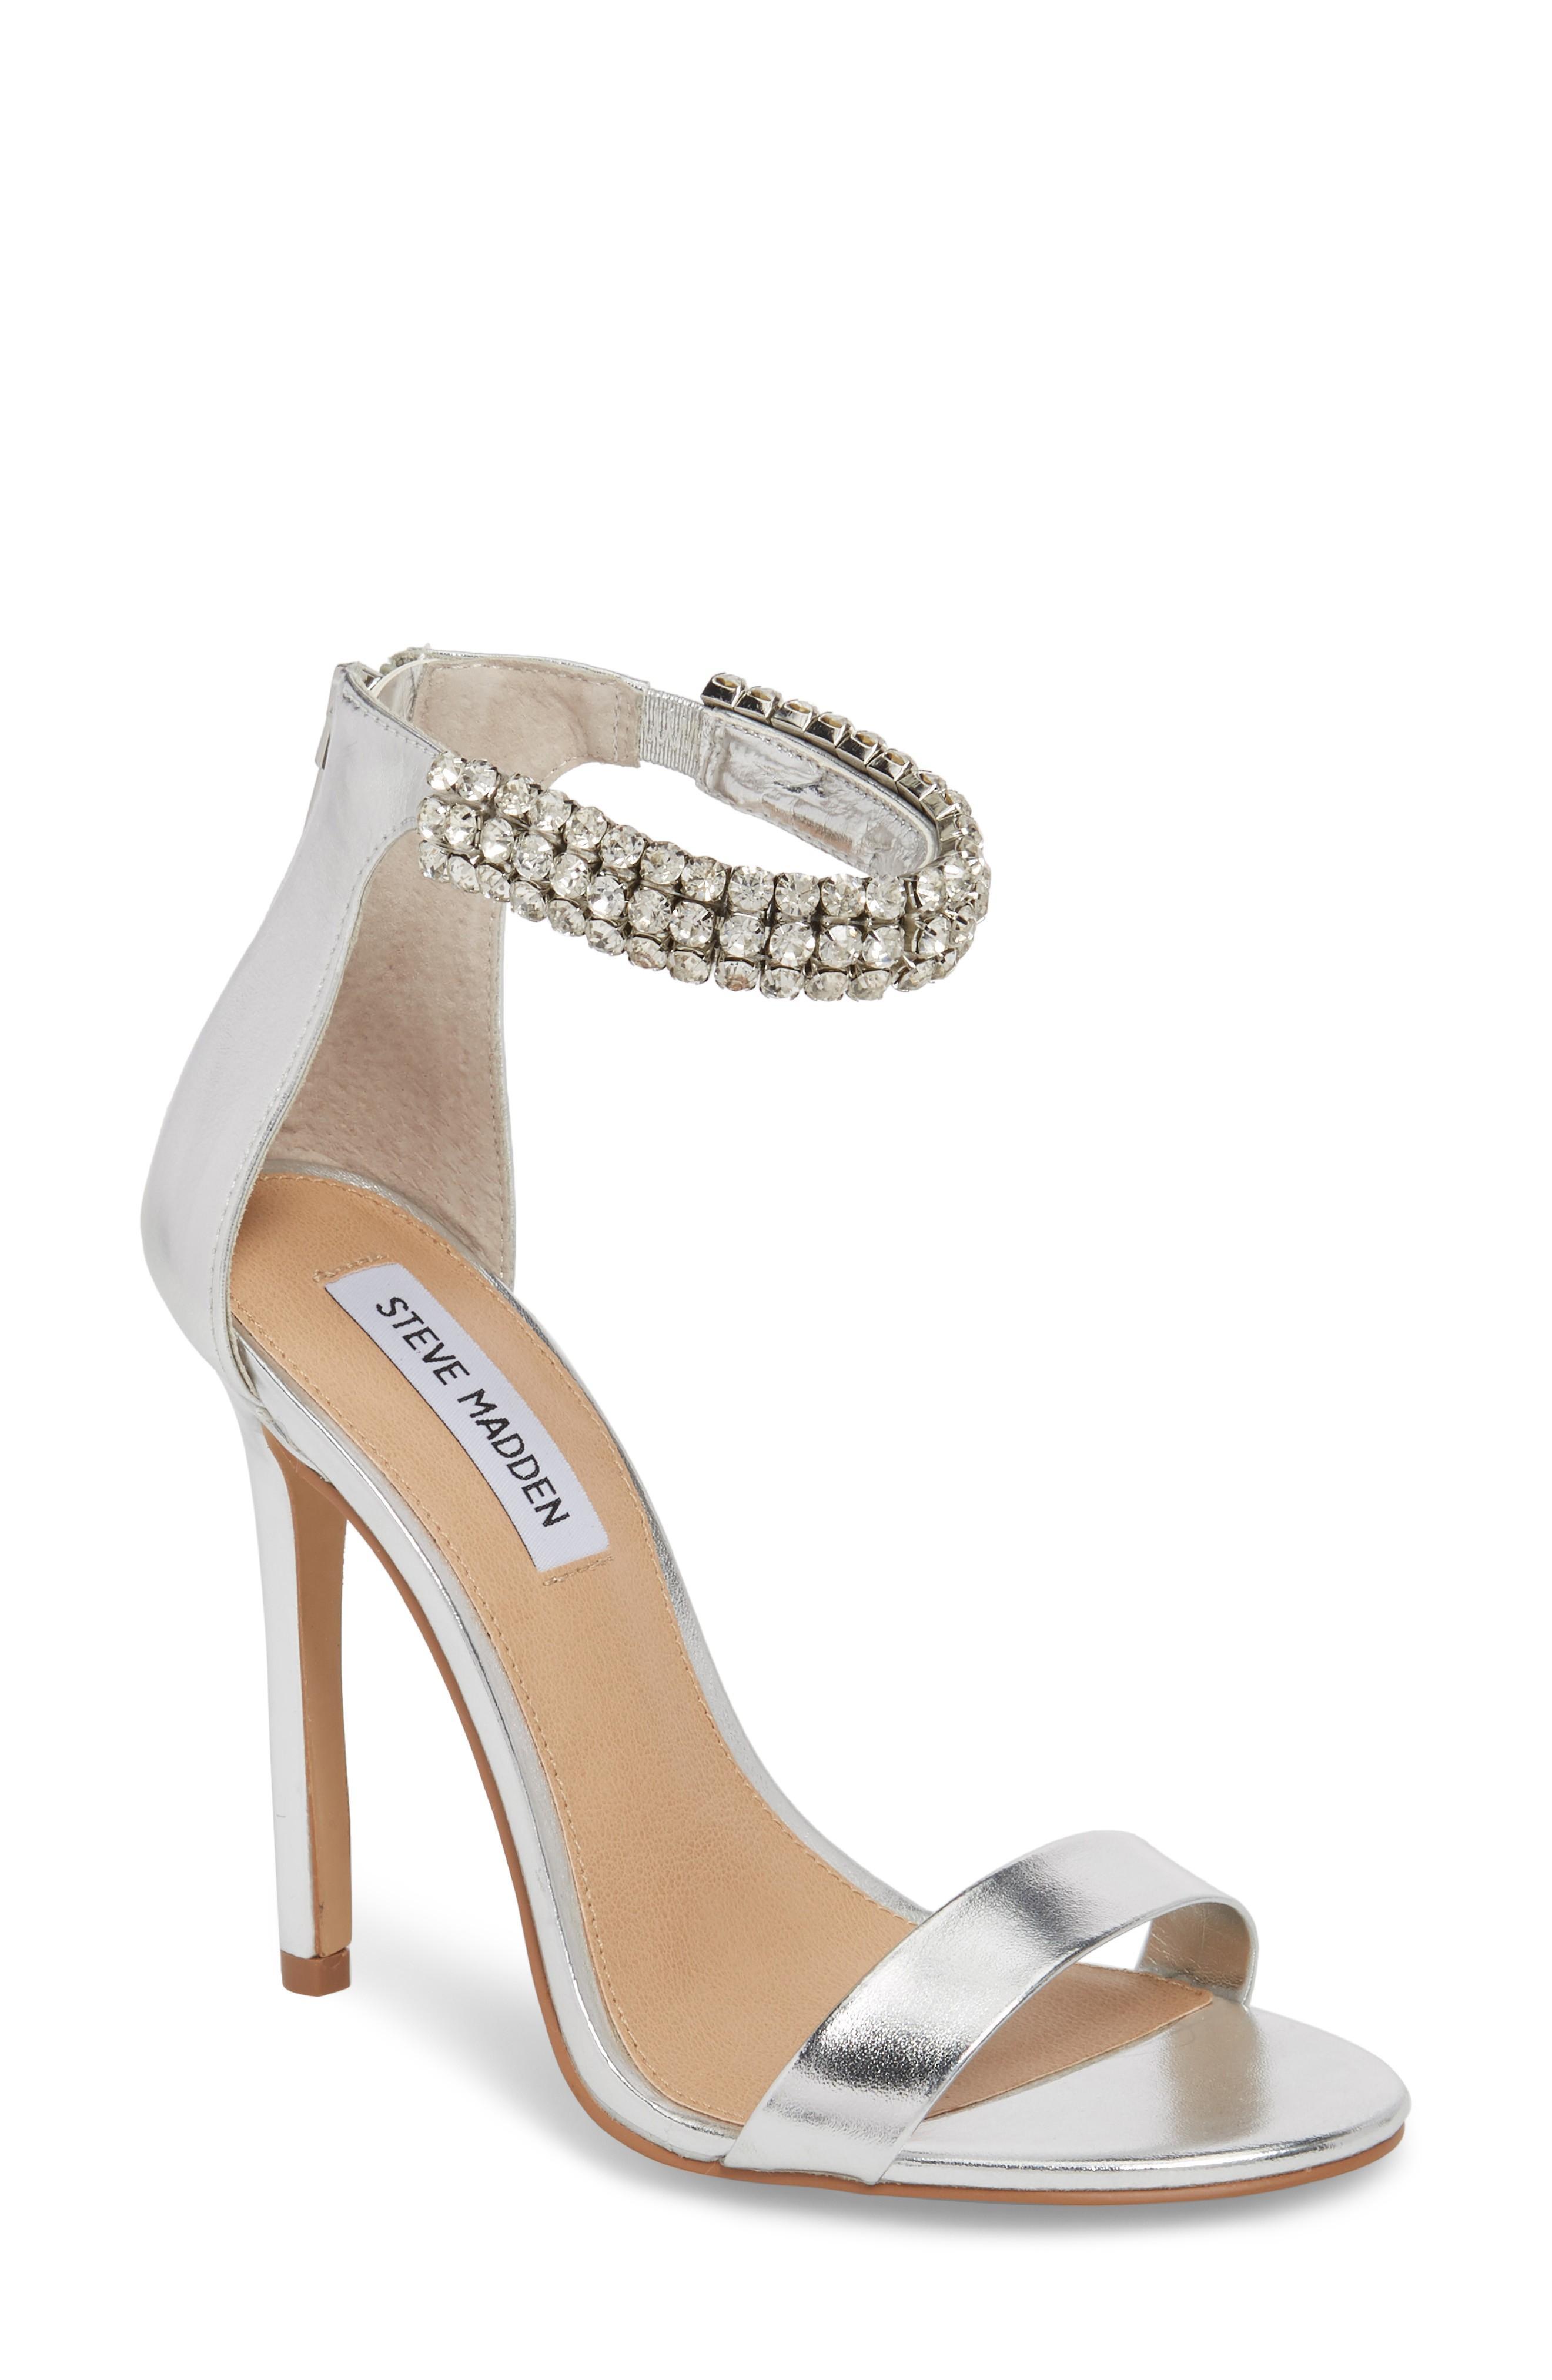 30494775418 Steve Madden Rando Crystal Sandal In Silver